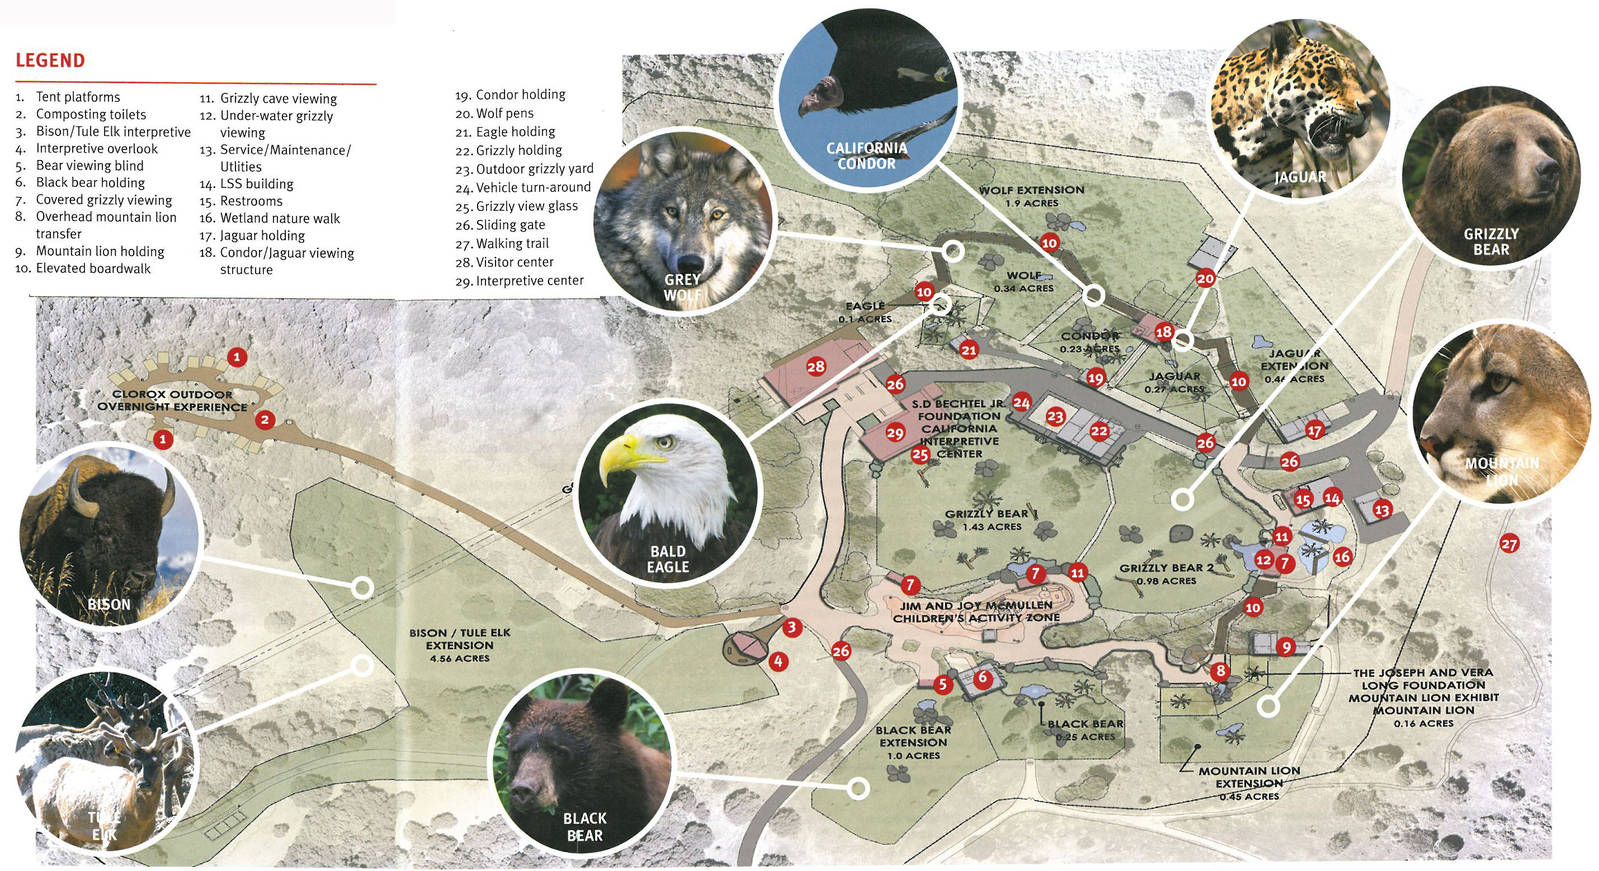 Oakland Zoo California Trail - Dinocro - Oakland Zoo California Trail Map